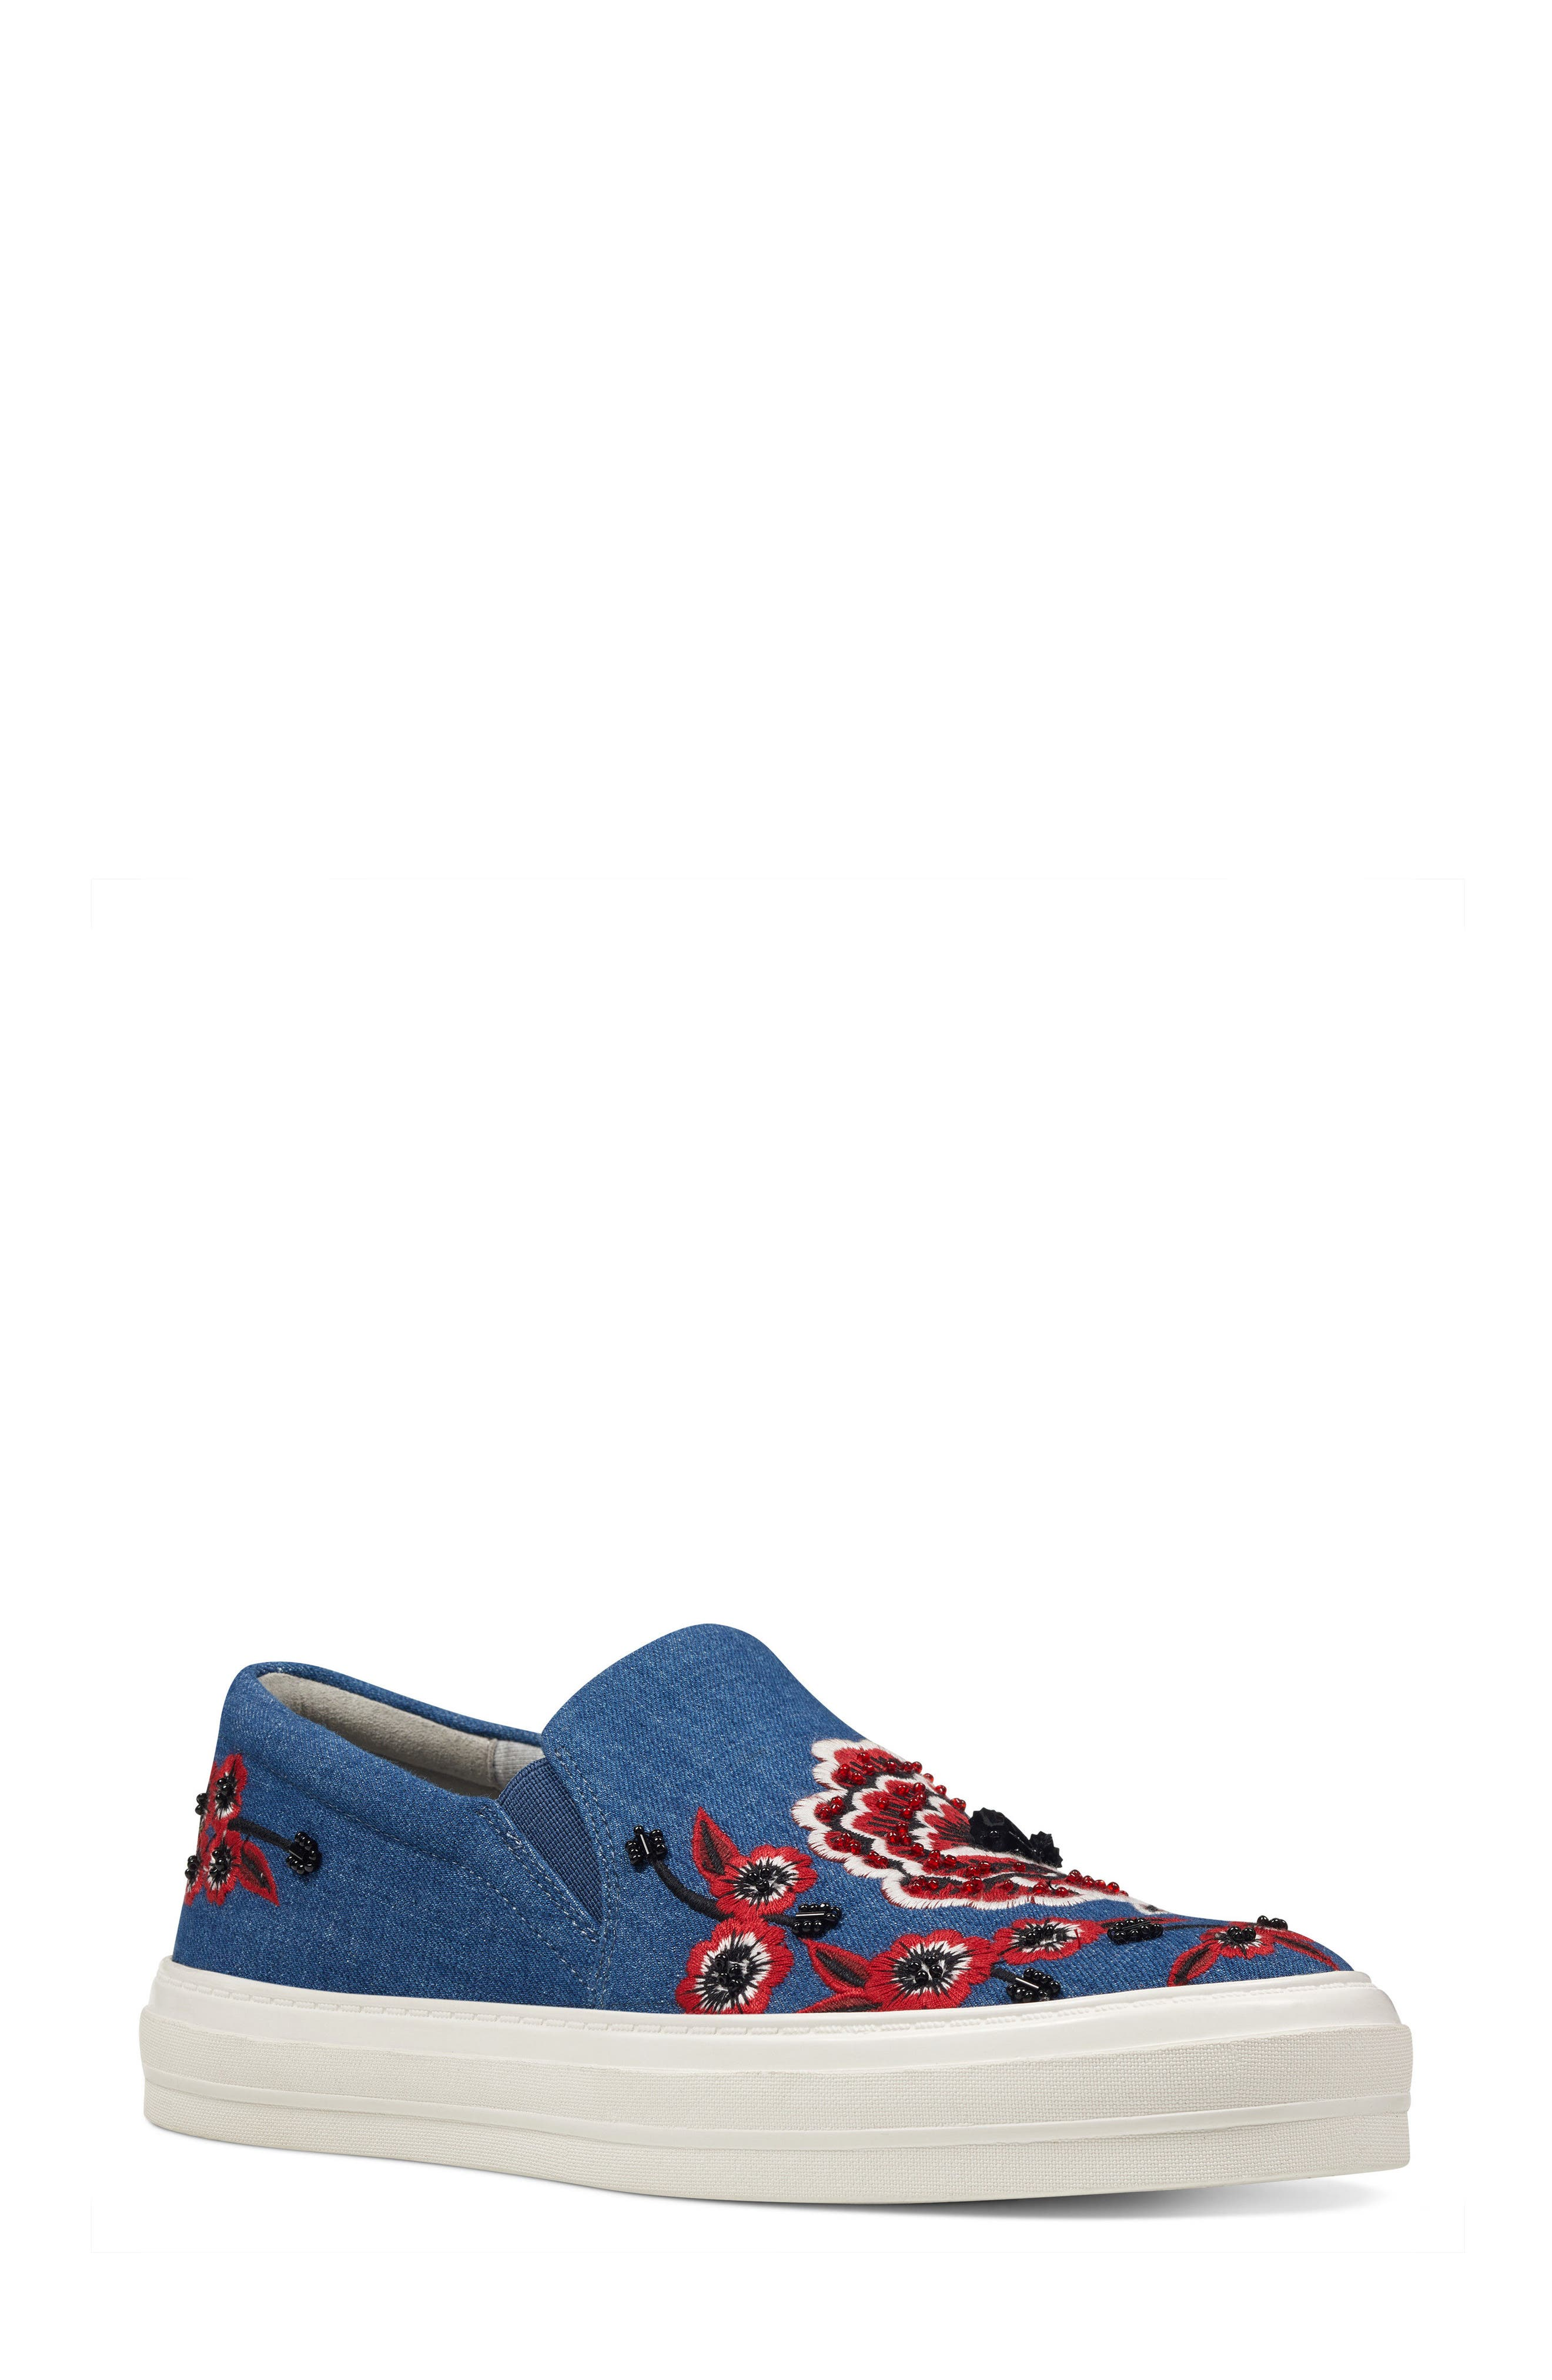 Alternate Image 1 Selected - Nine West Onyeka Embroidered Slip-On Sneaker (Women)